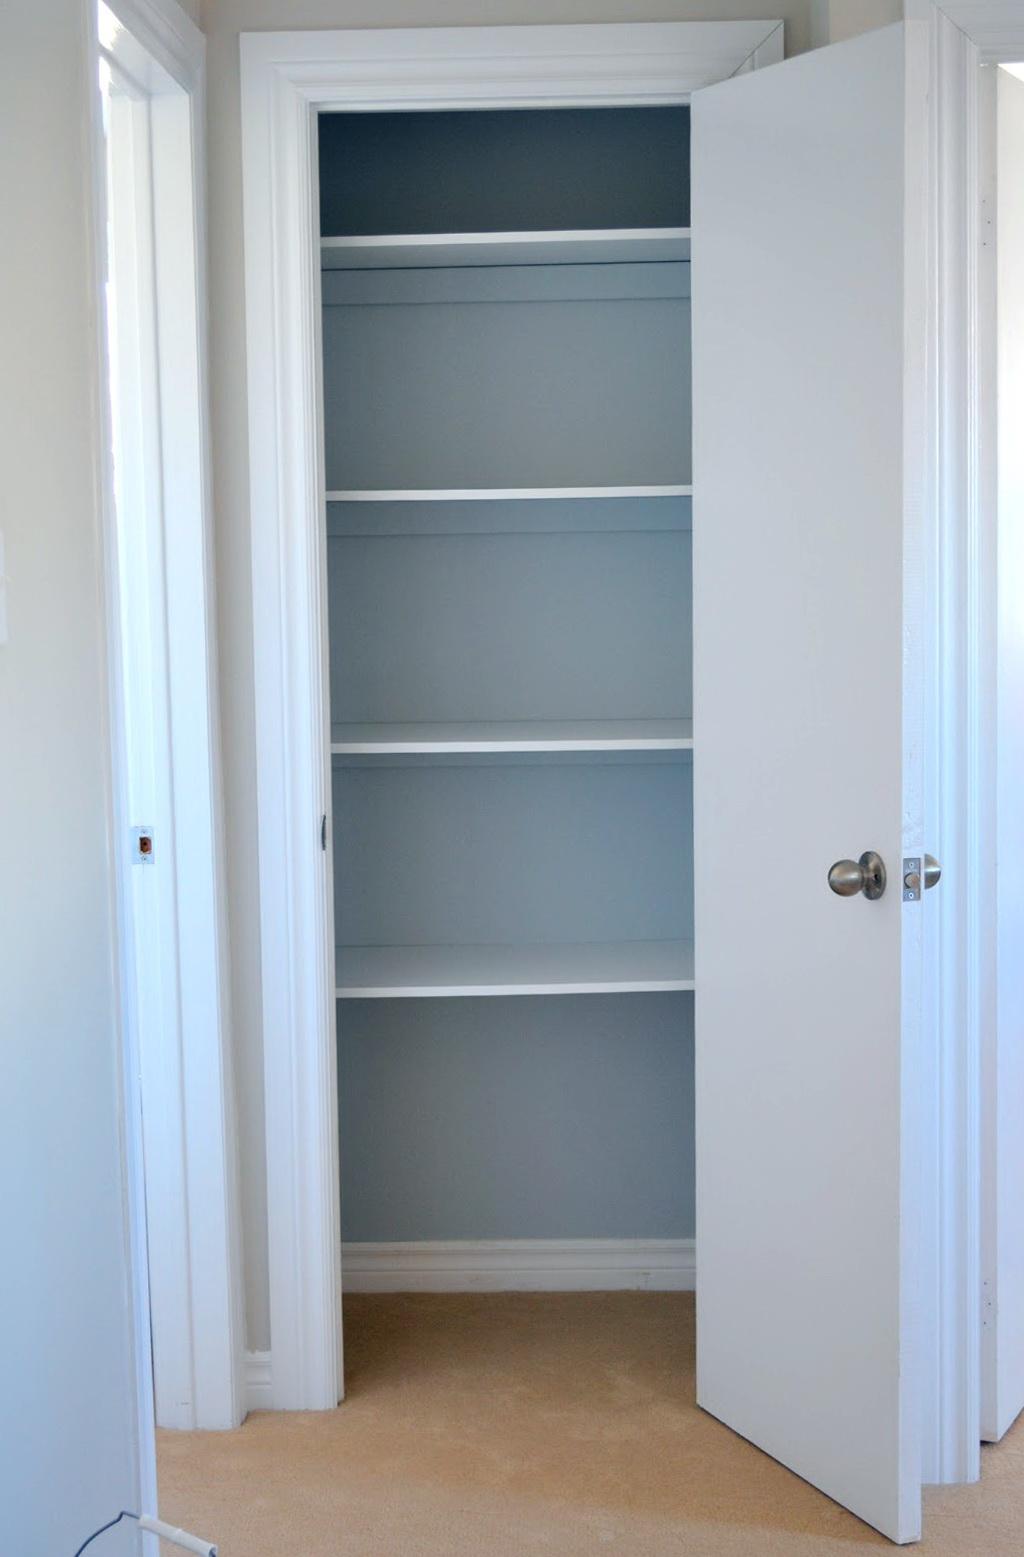 Linen closet shelving ideas home design ideas for Linen closet designs